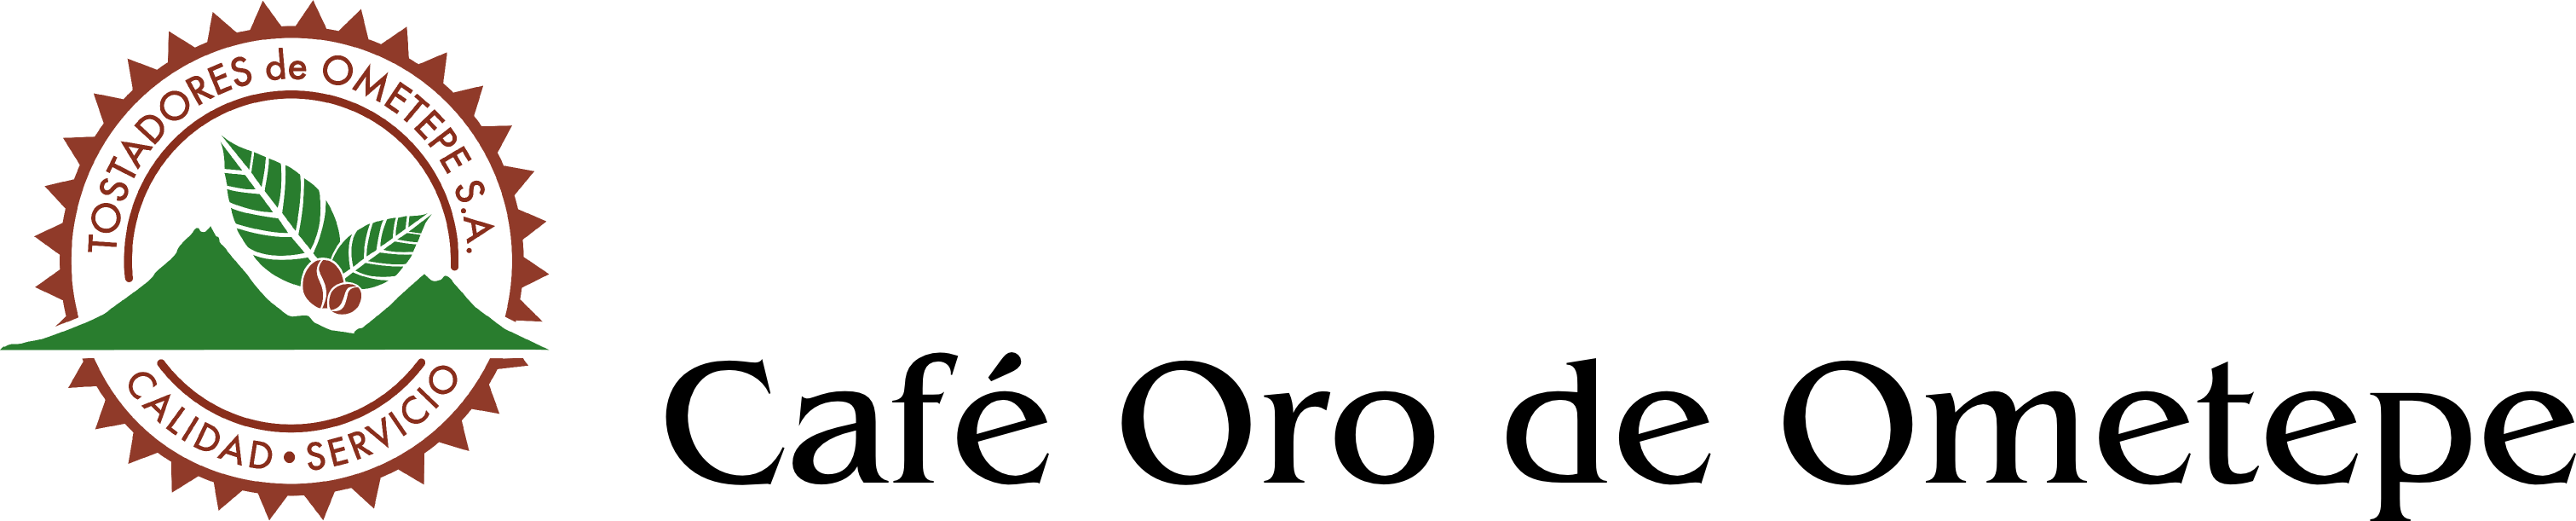 Tostadores Ometepe